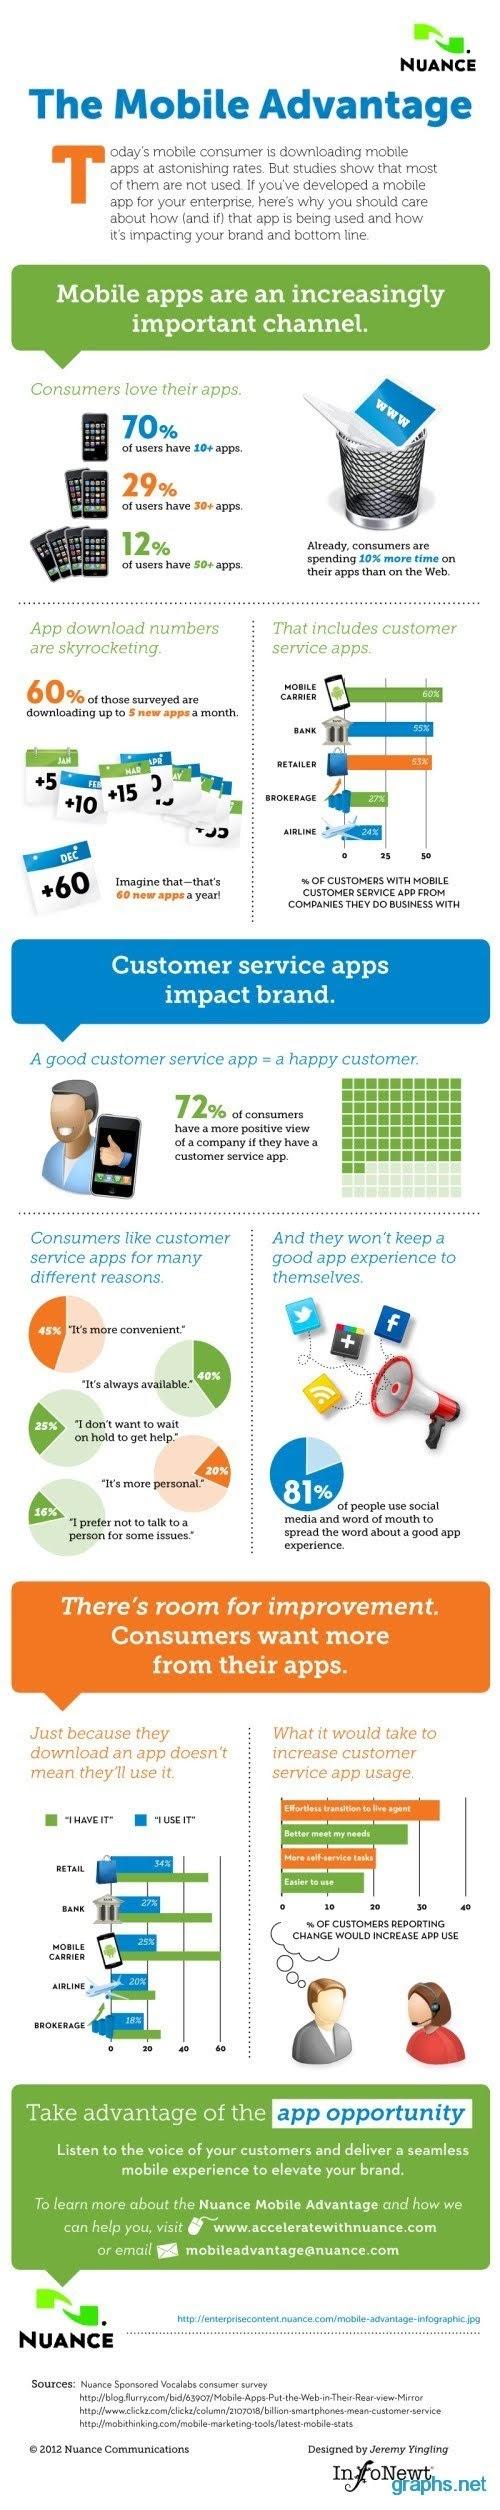 Mobile Marketing Advantages #infographic